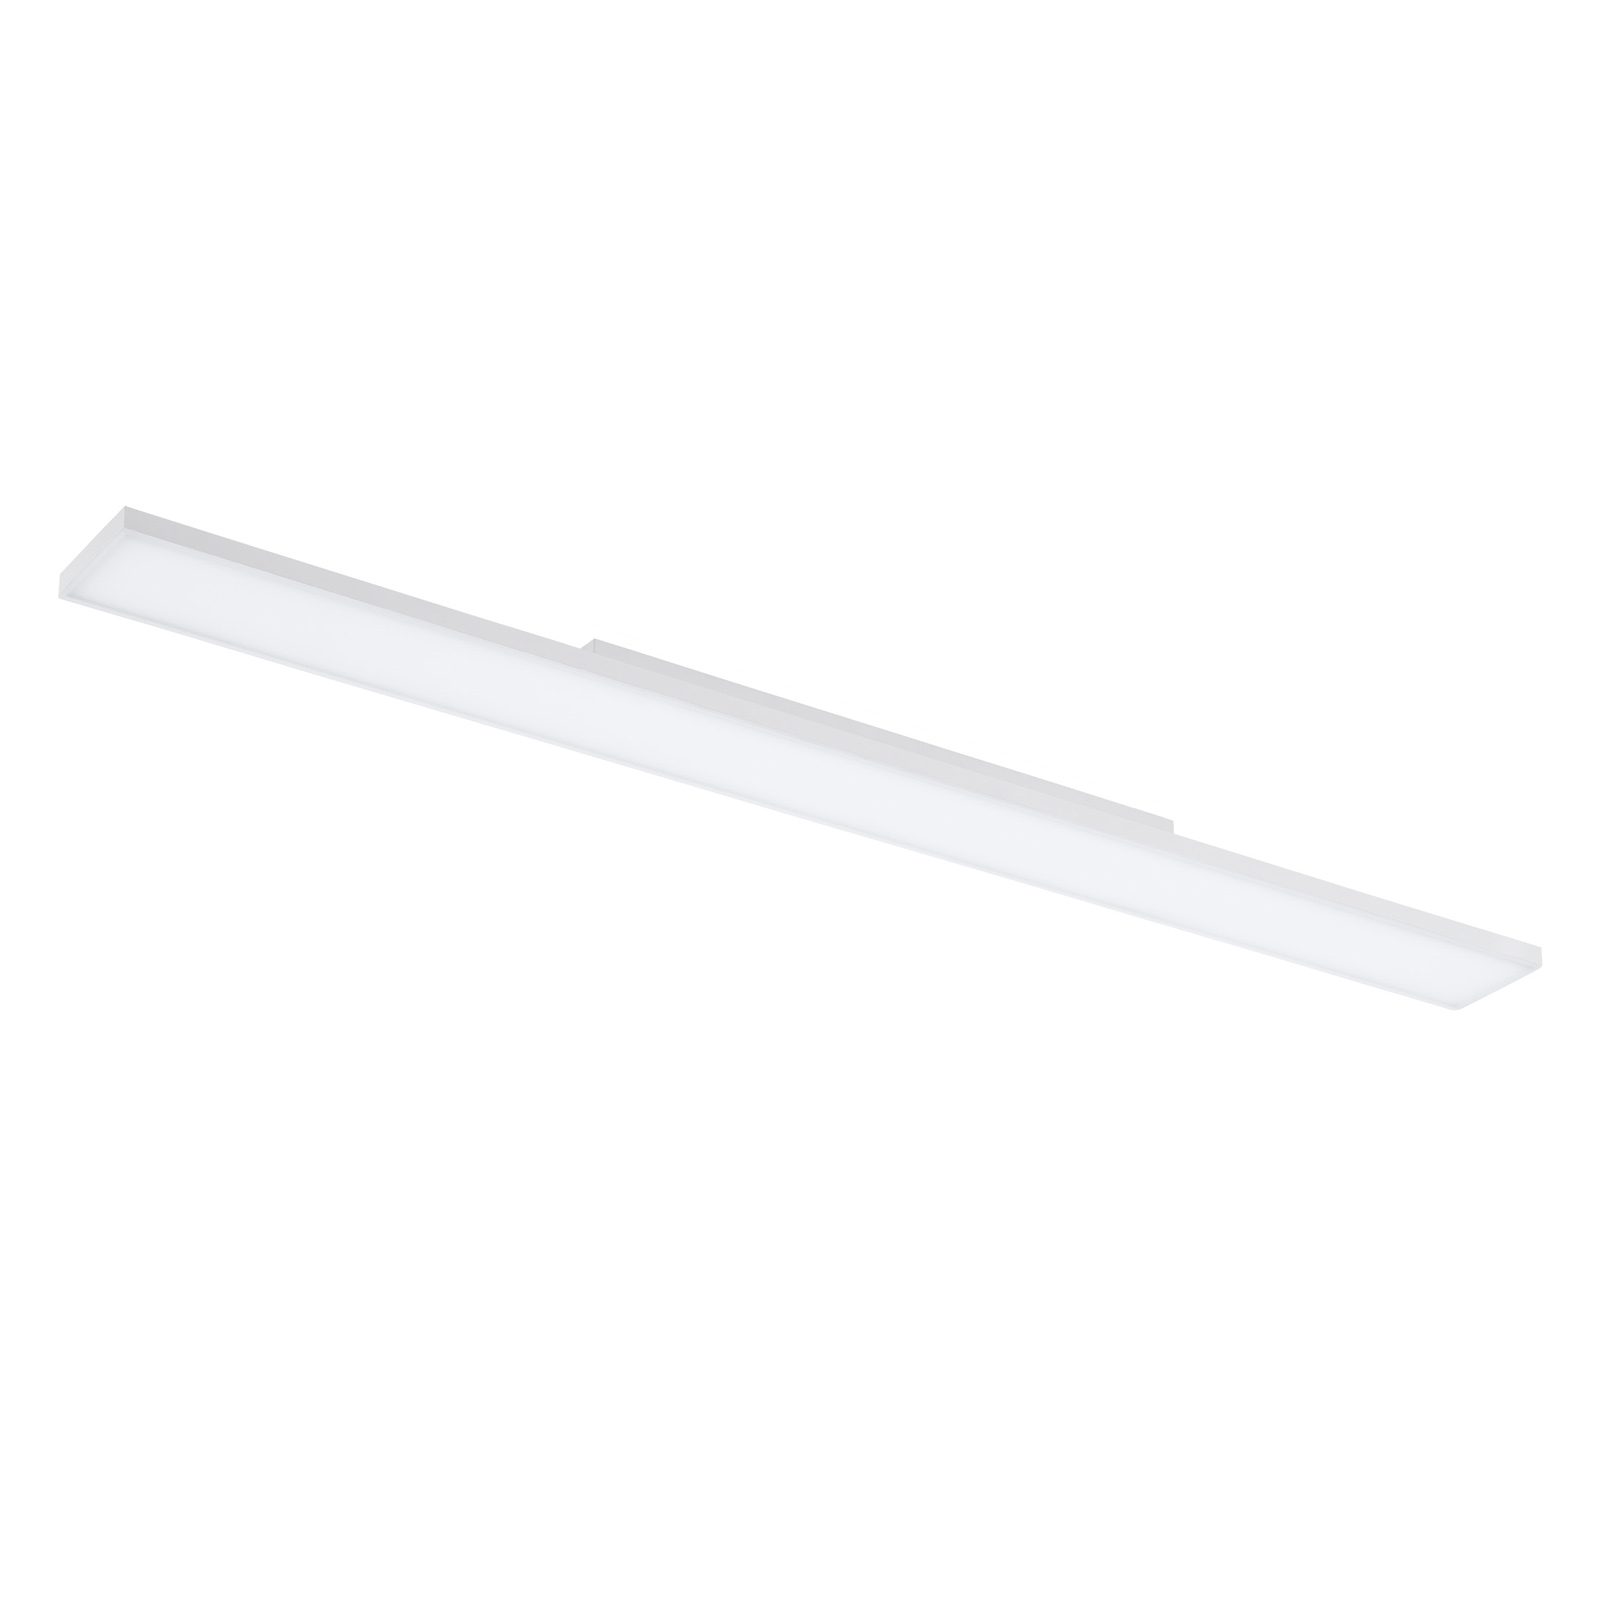 Lampa sufitowa LED Turcona, 120 x 10 cm